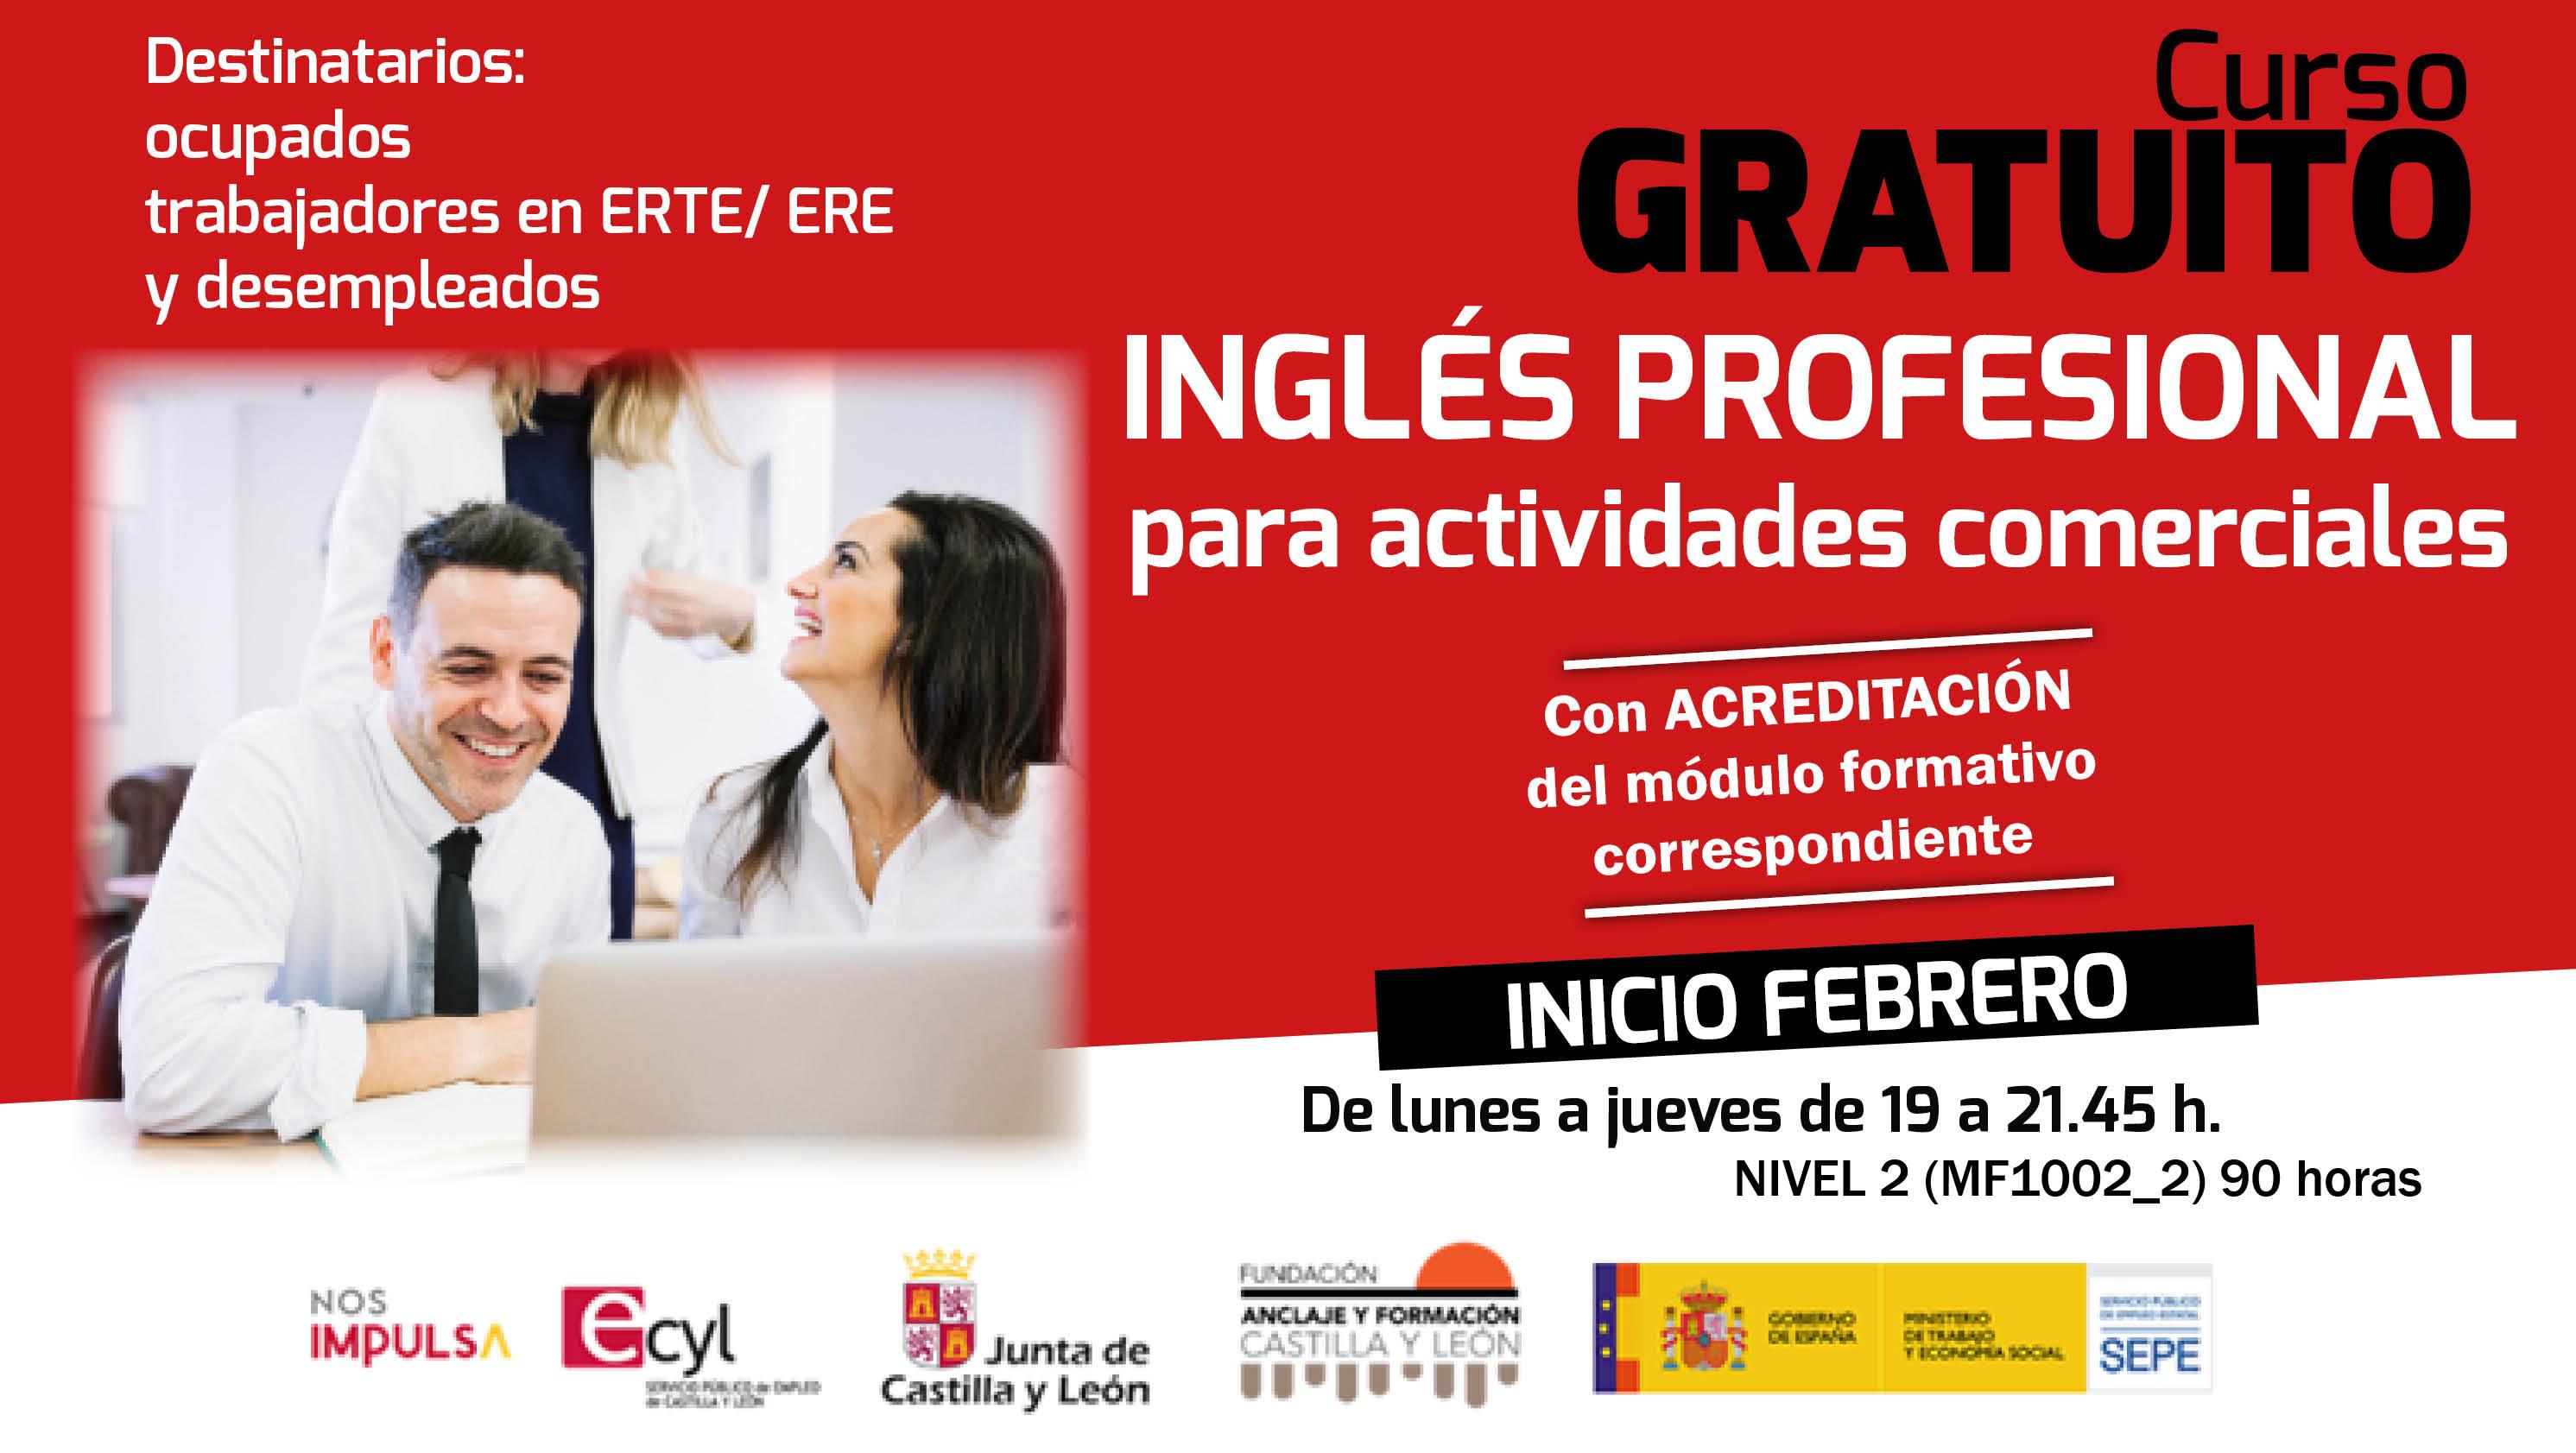 Inglés profesional para actividades comerciales